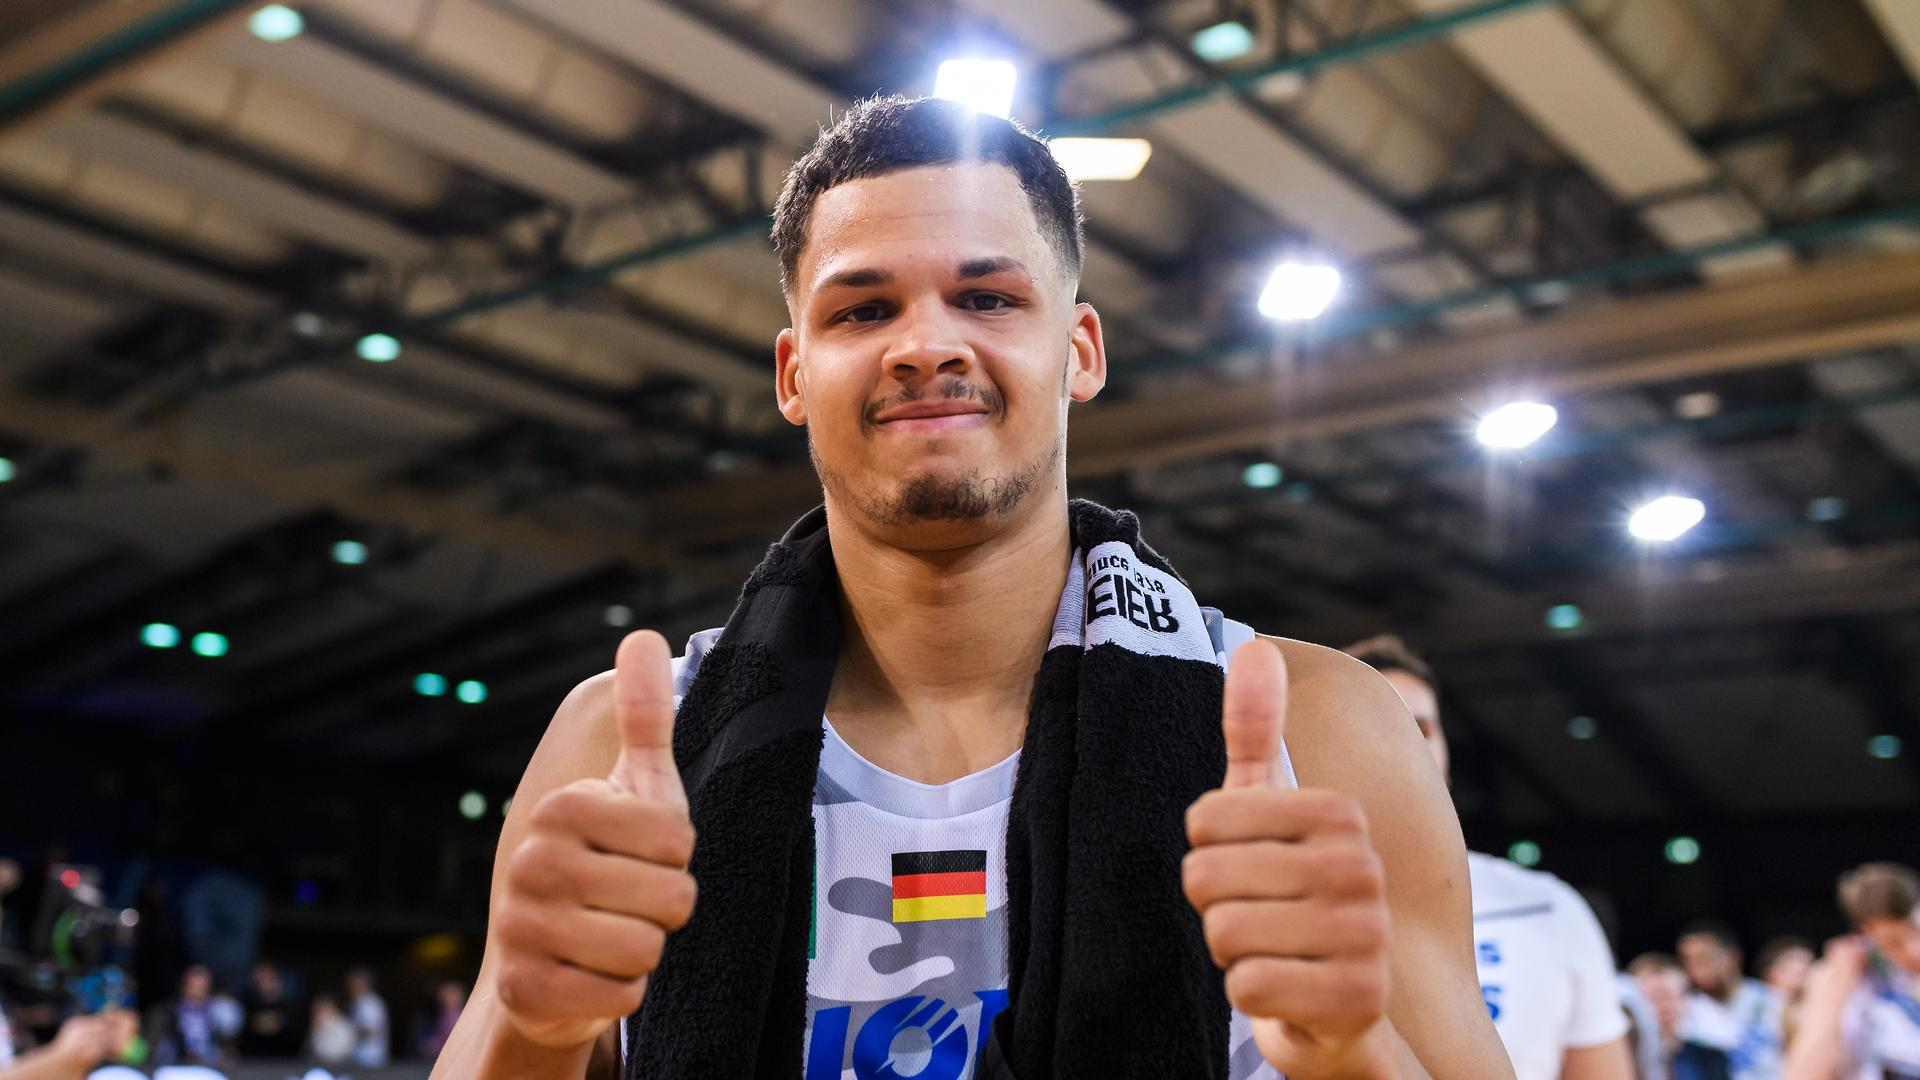 Schlussjubel nach Spielende, Maurice Pluskota (Lions) zeigt Daumen hoch.  GES/ Basketball/ ProA: PSK Lions - Ehingen Urspring, 25.01.2020 --